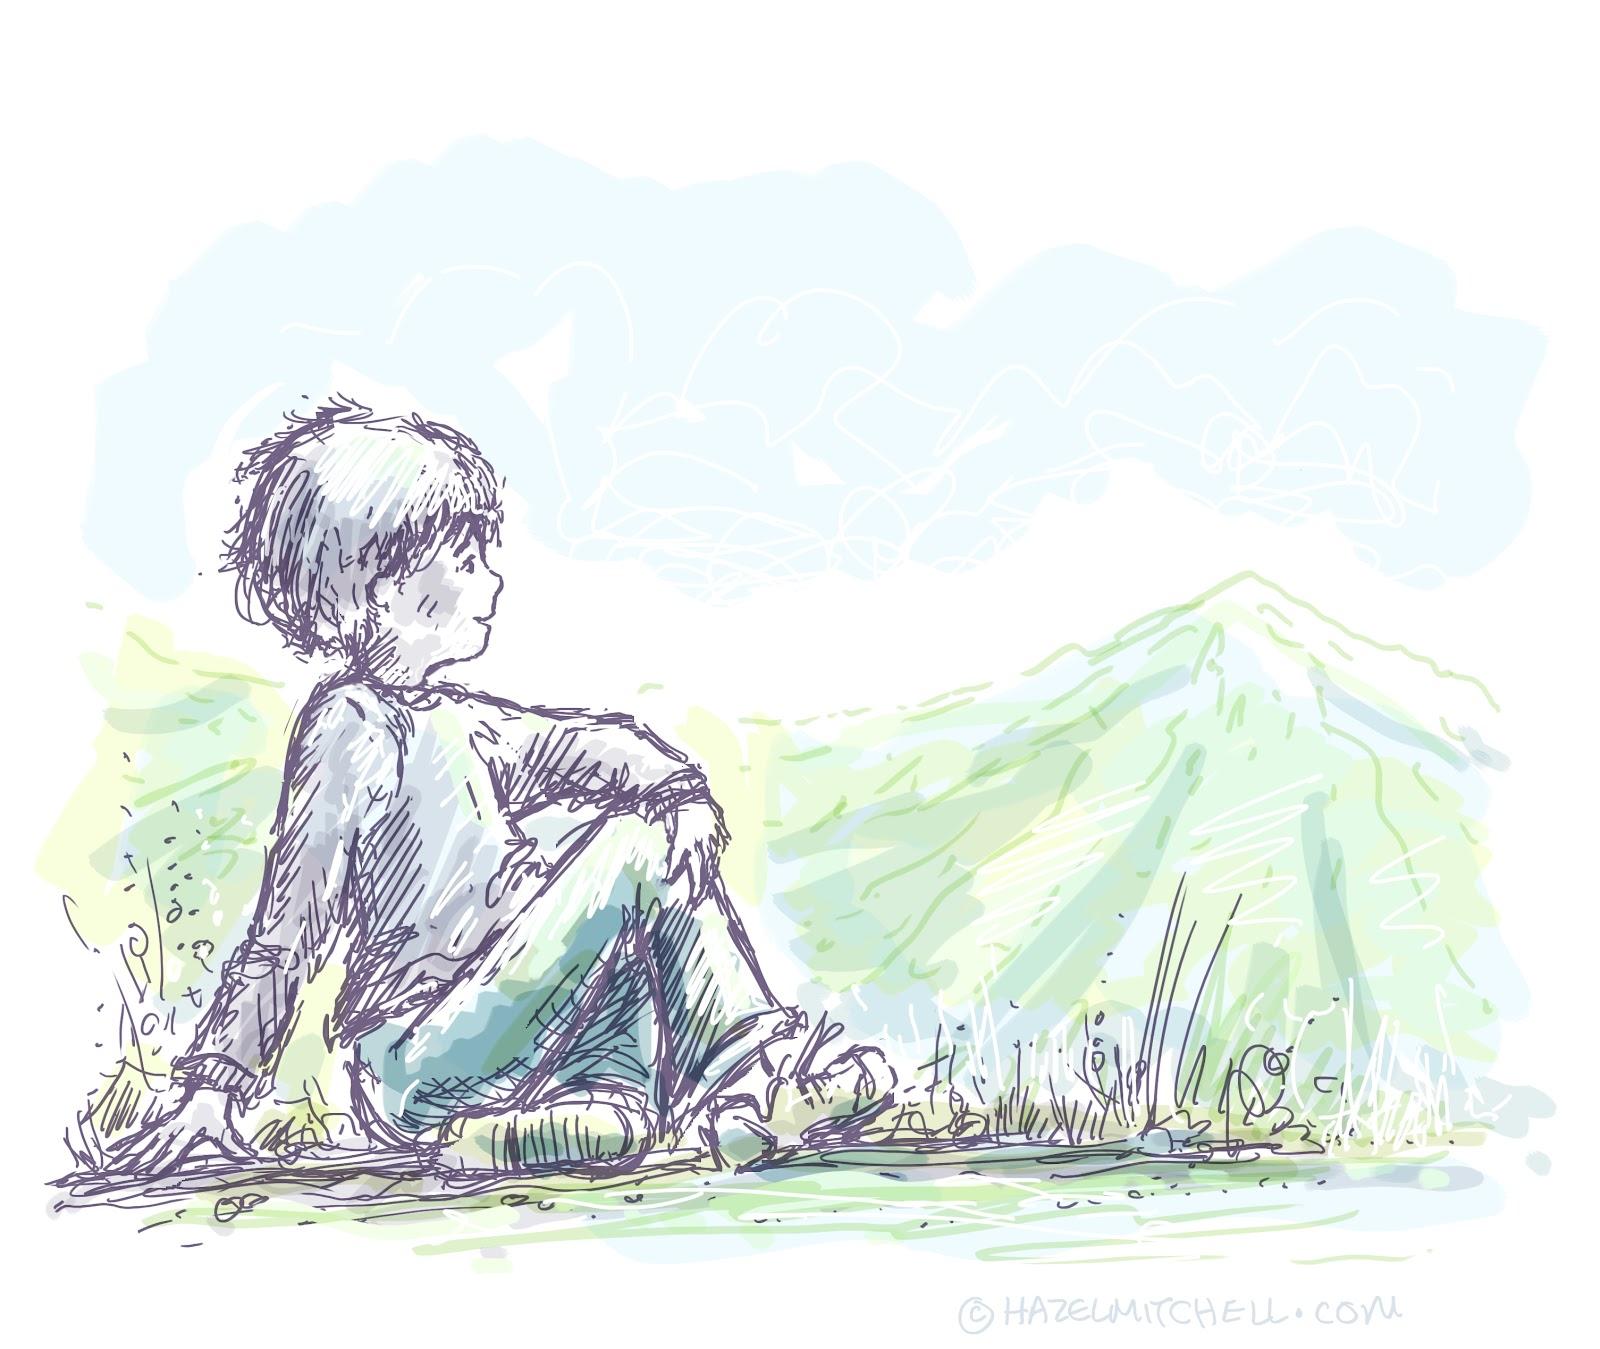 Childrens publishing blogs drawing digitally blog posts